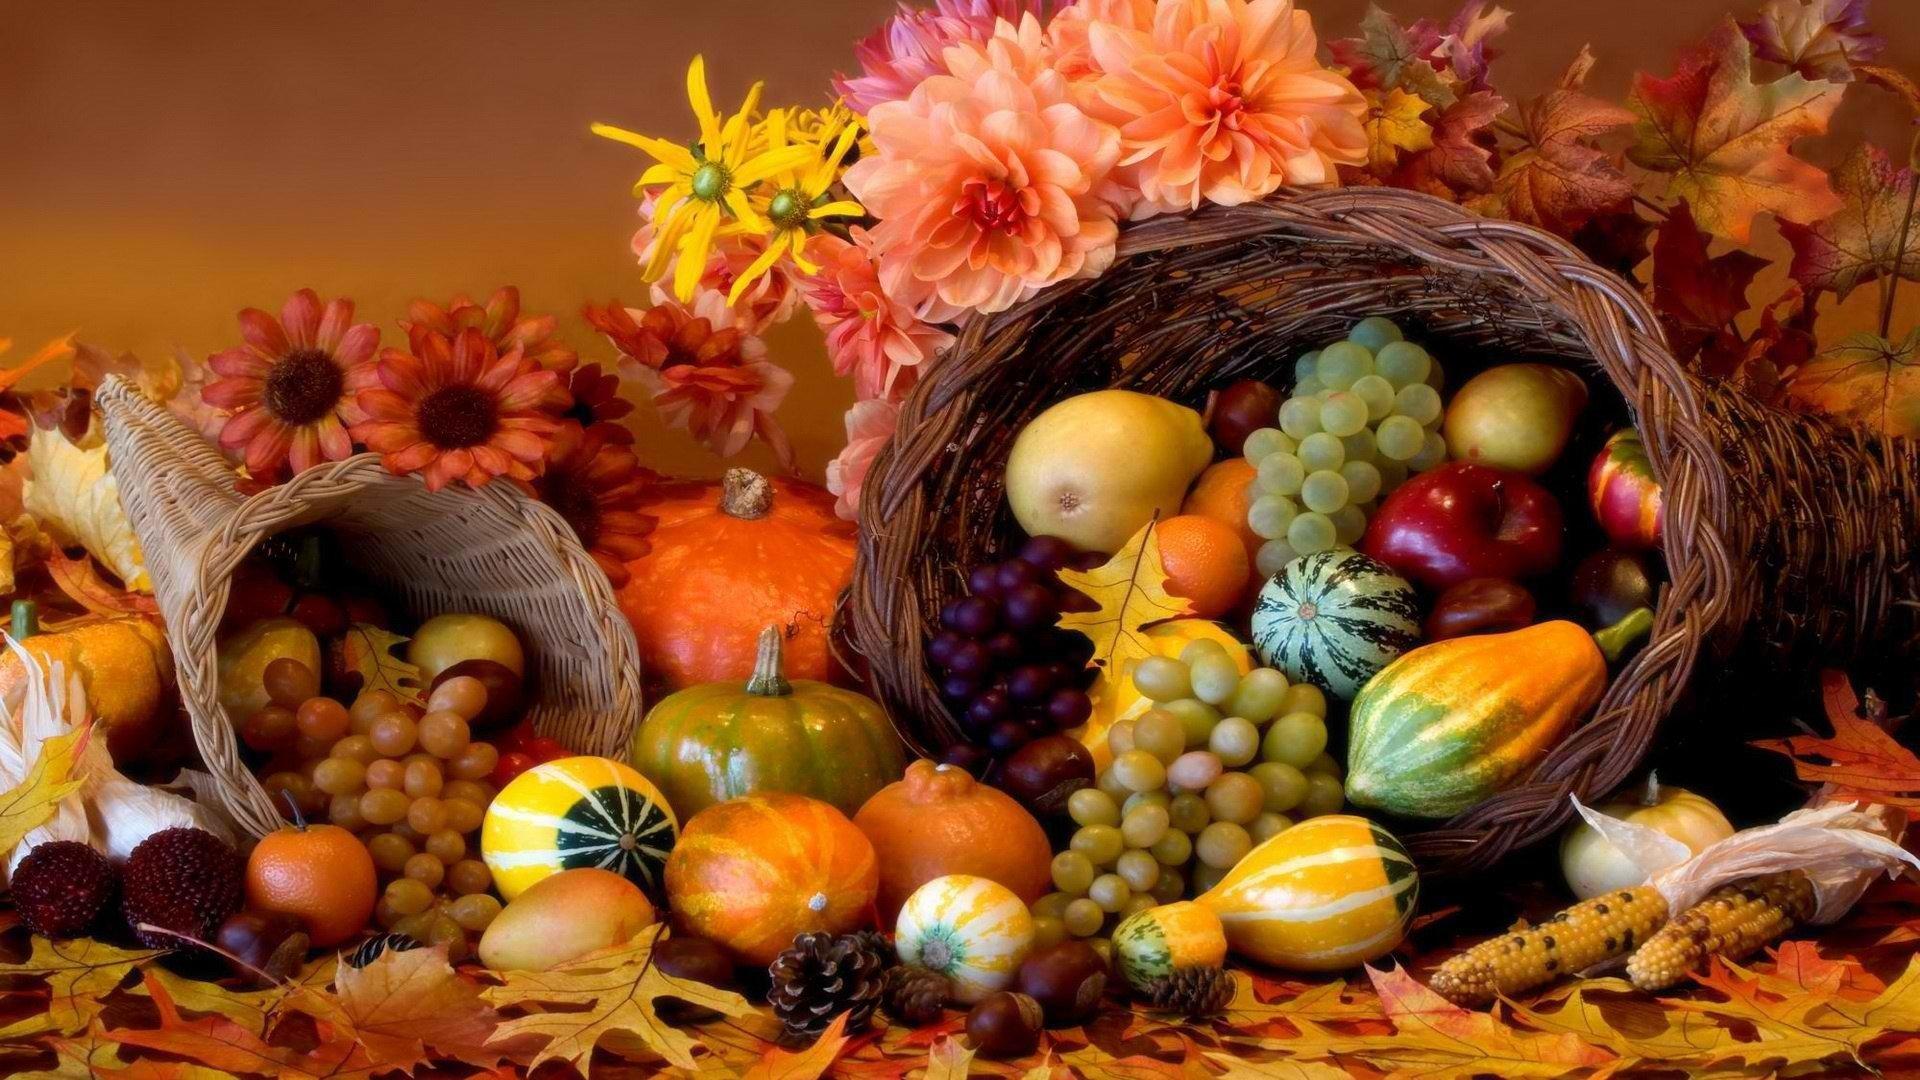 Thanksgiving Wallpaper Pic